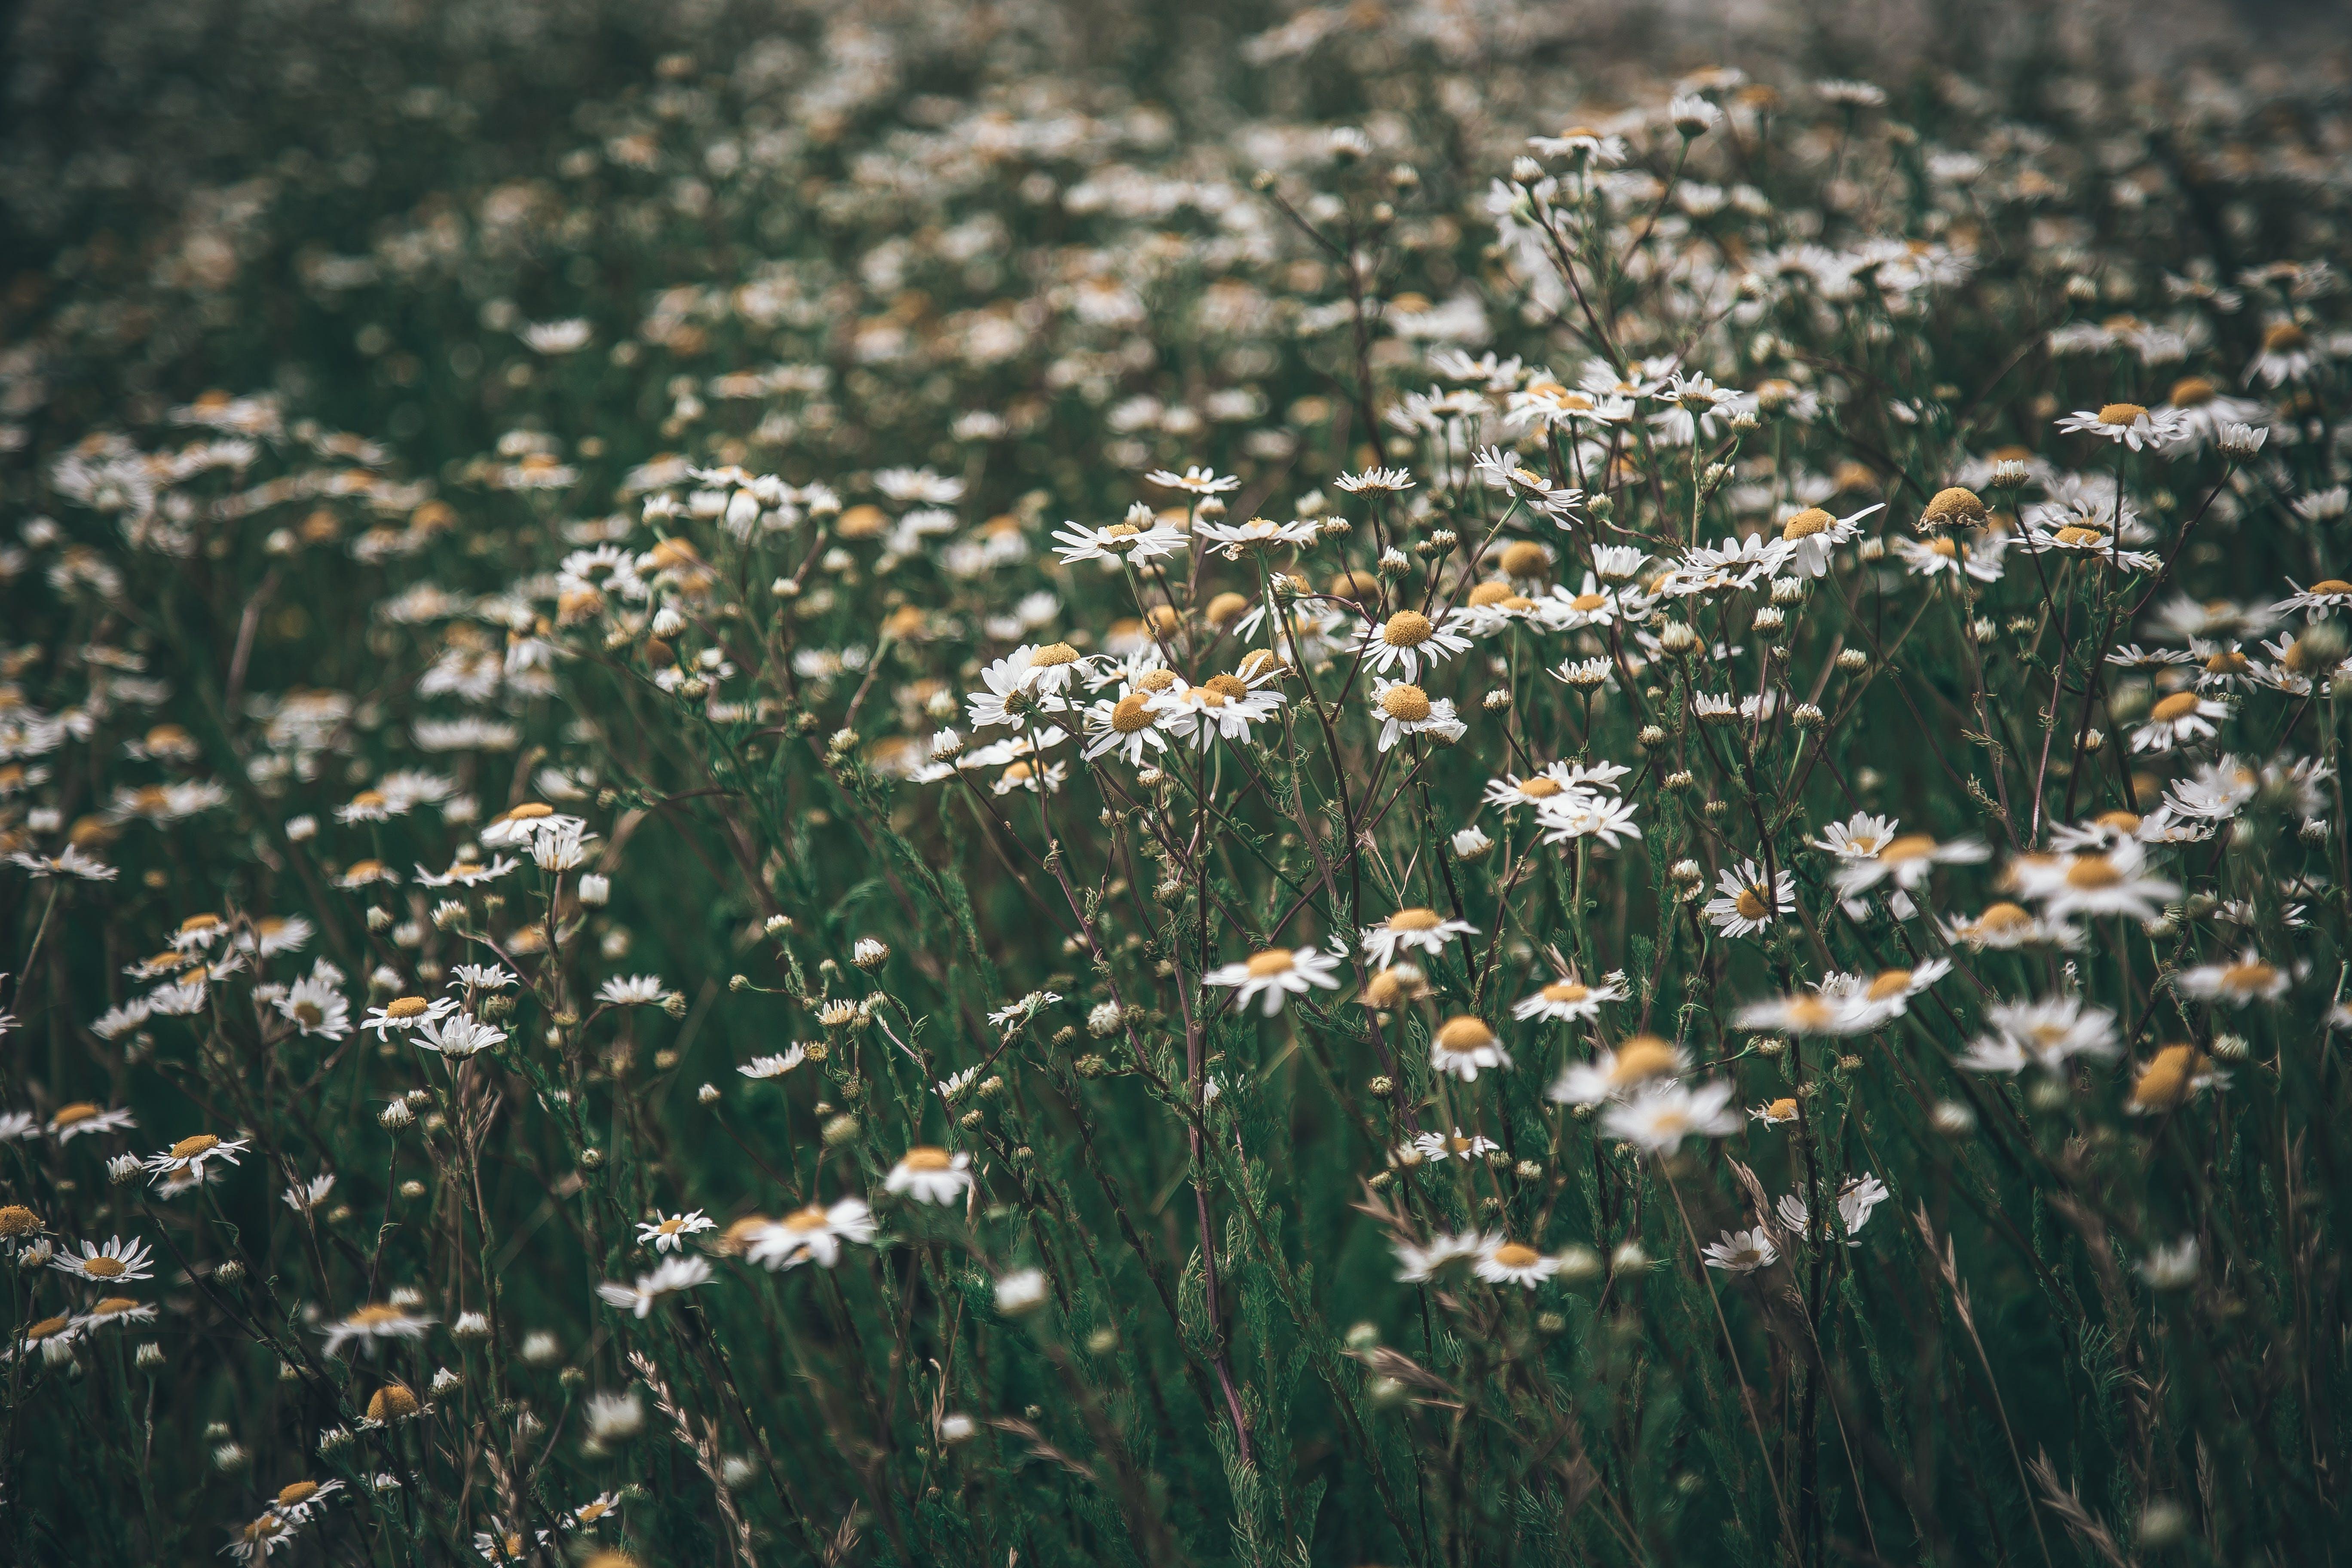 White Common Daisy Flowers